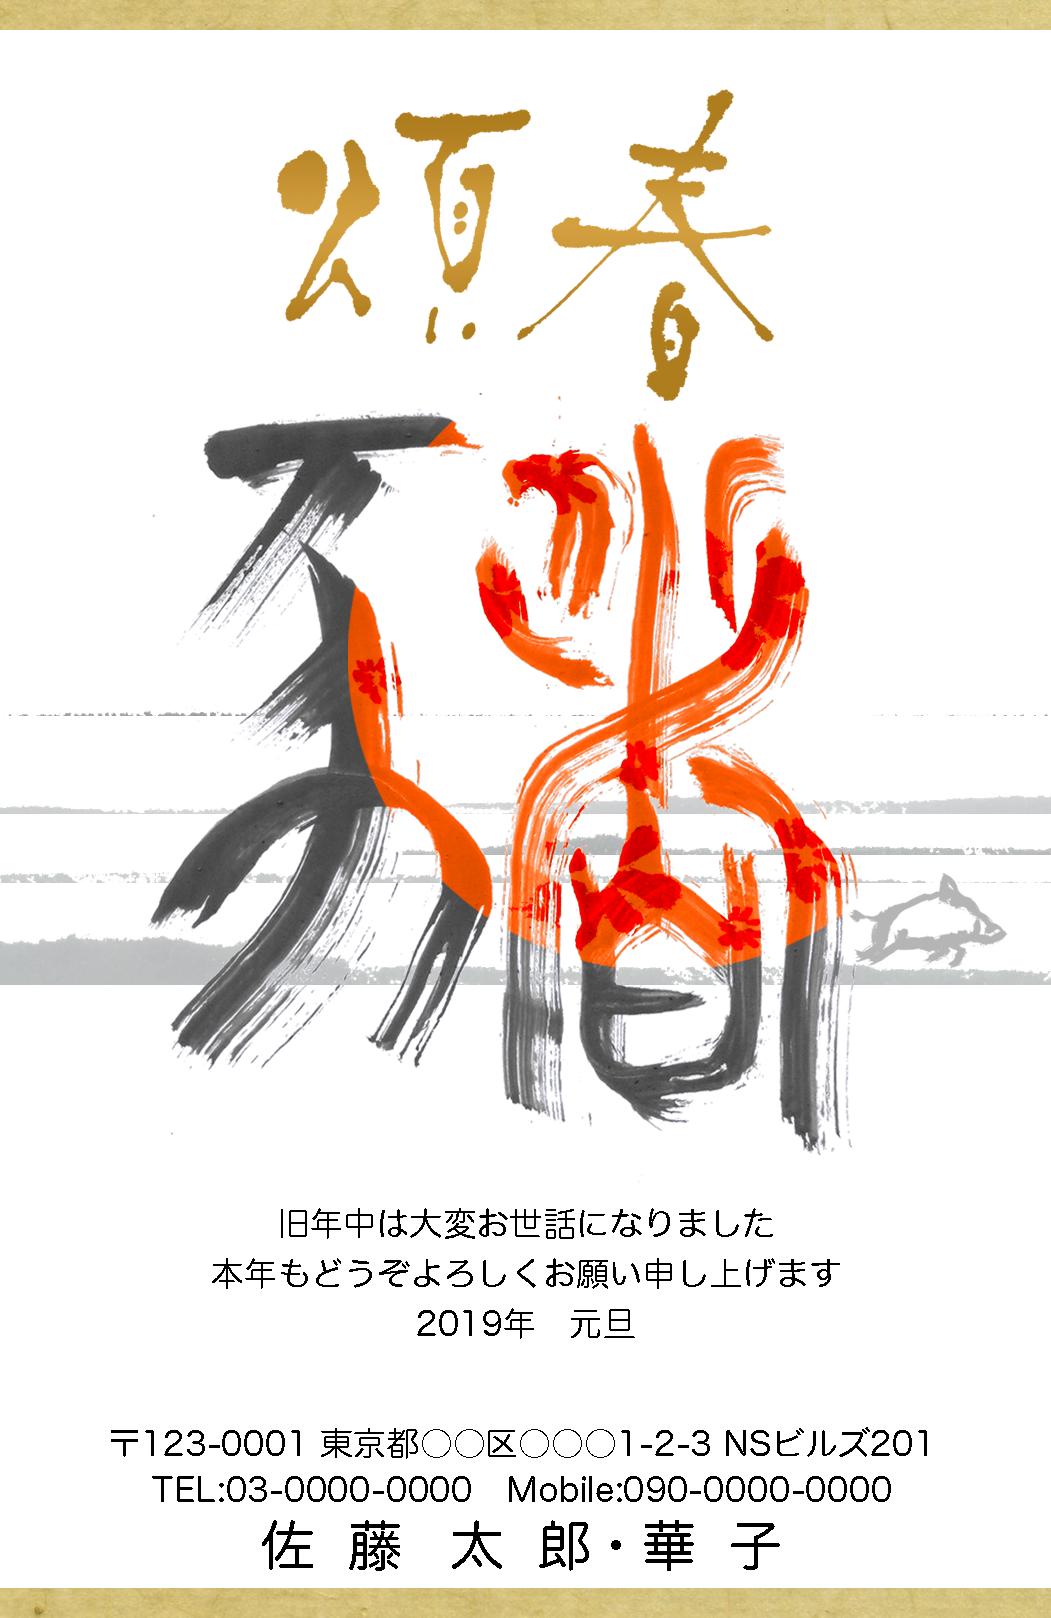 mameshiba/平成最後の特製オリジナル亥年年賀状~猪/初日の出/和風/創作書画/渋い/大人向け/頌春/2019年~